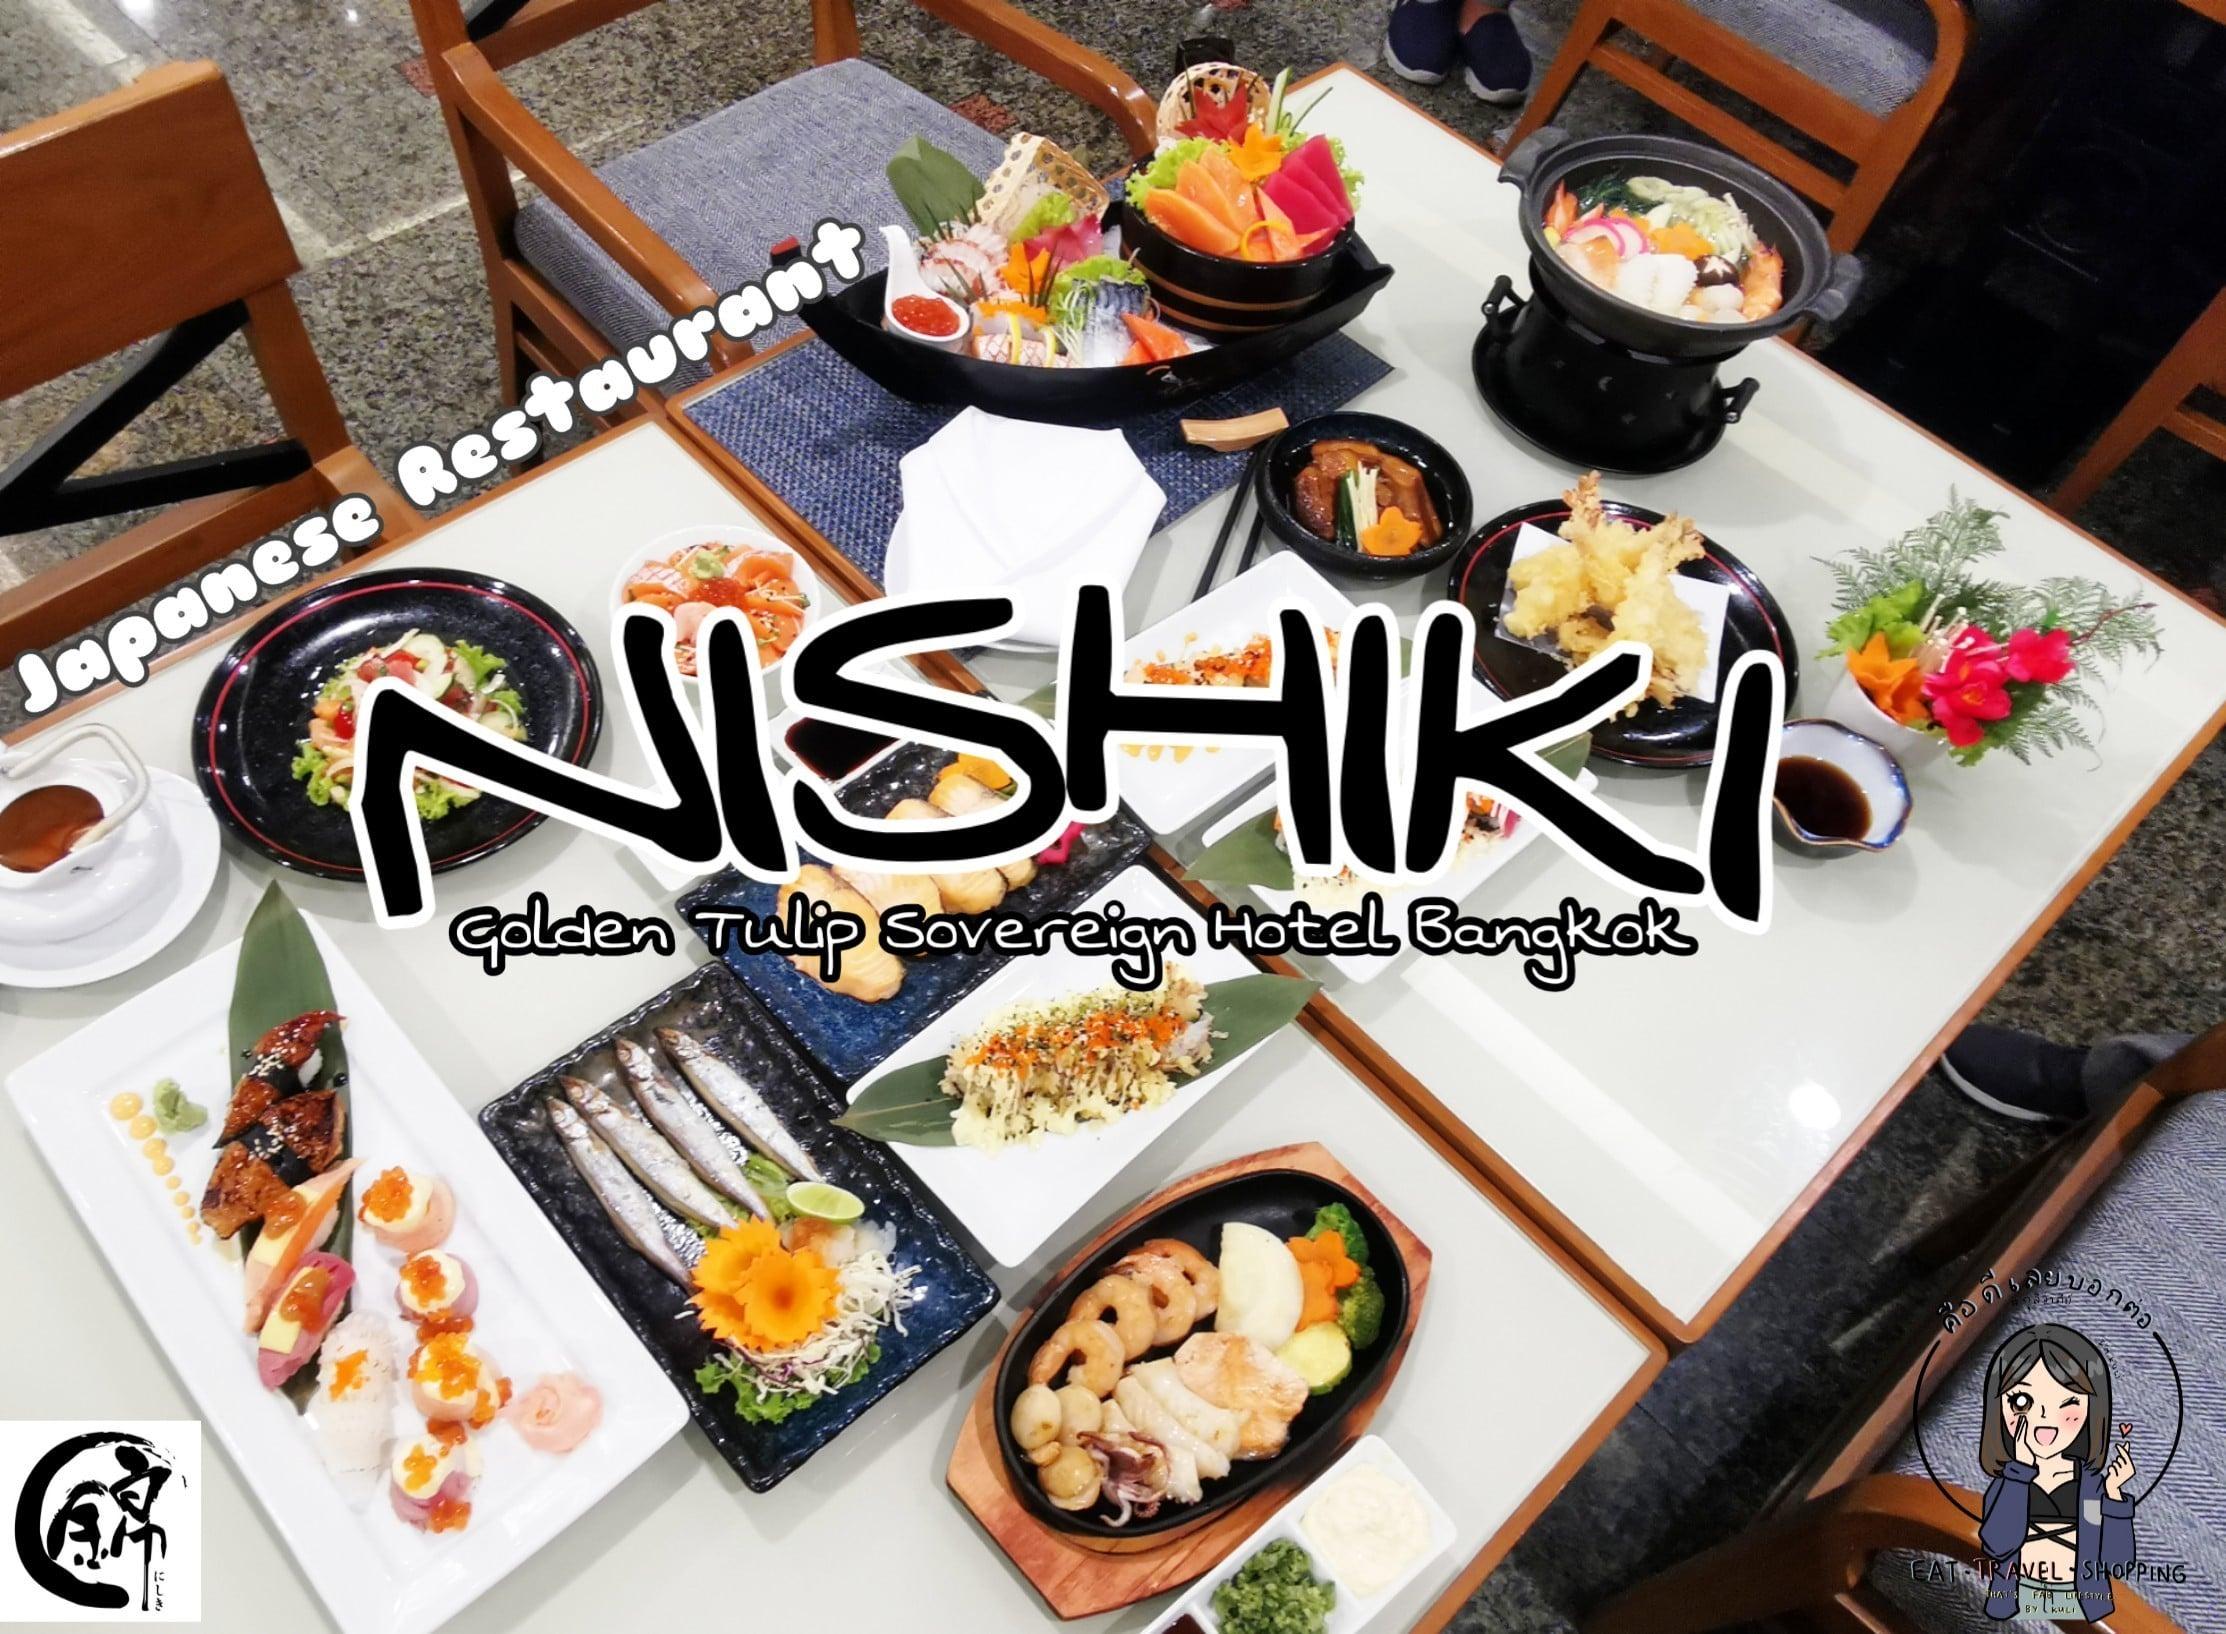 NISHIKI JAPANESE RESTAURANT อาหารญี่ปุ่น  สุดคุ้ม ไม่จำกัดเวลา